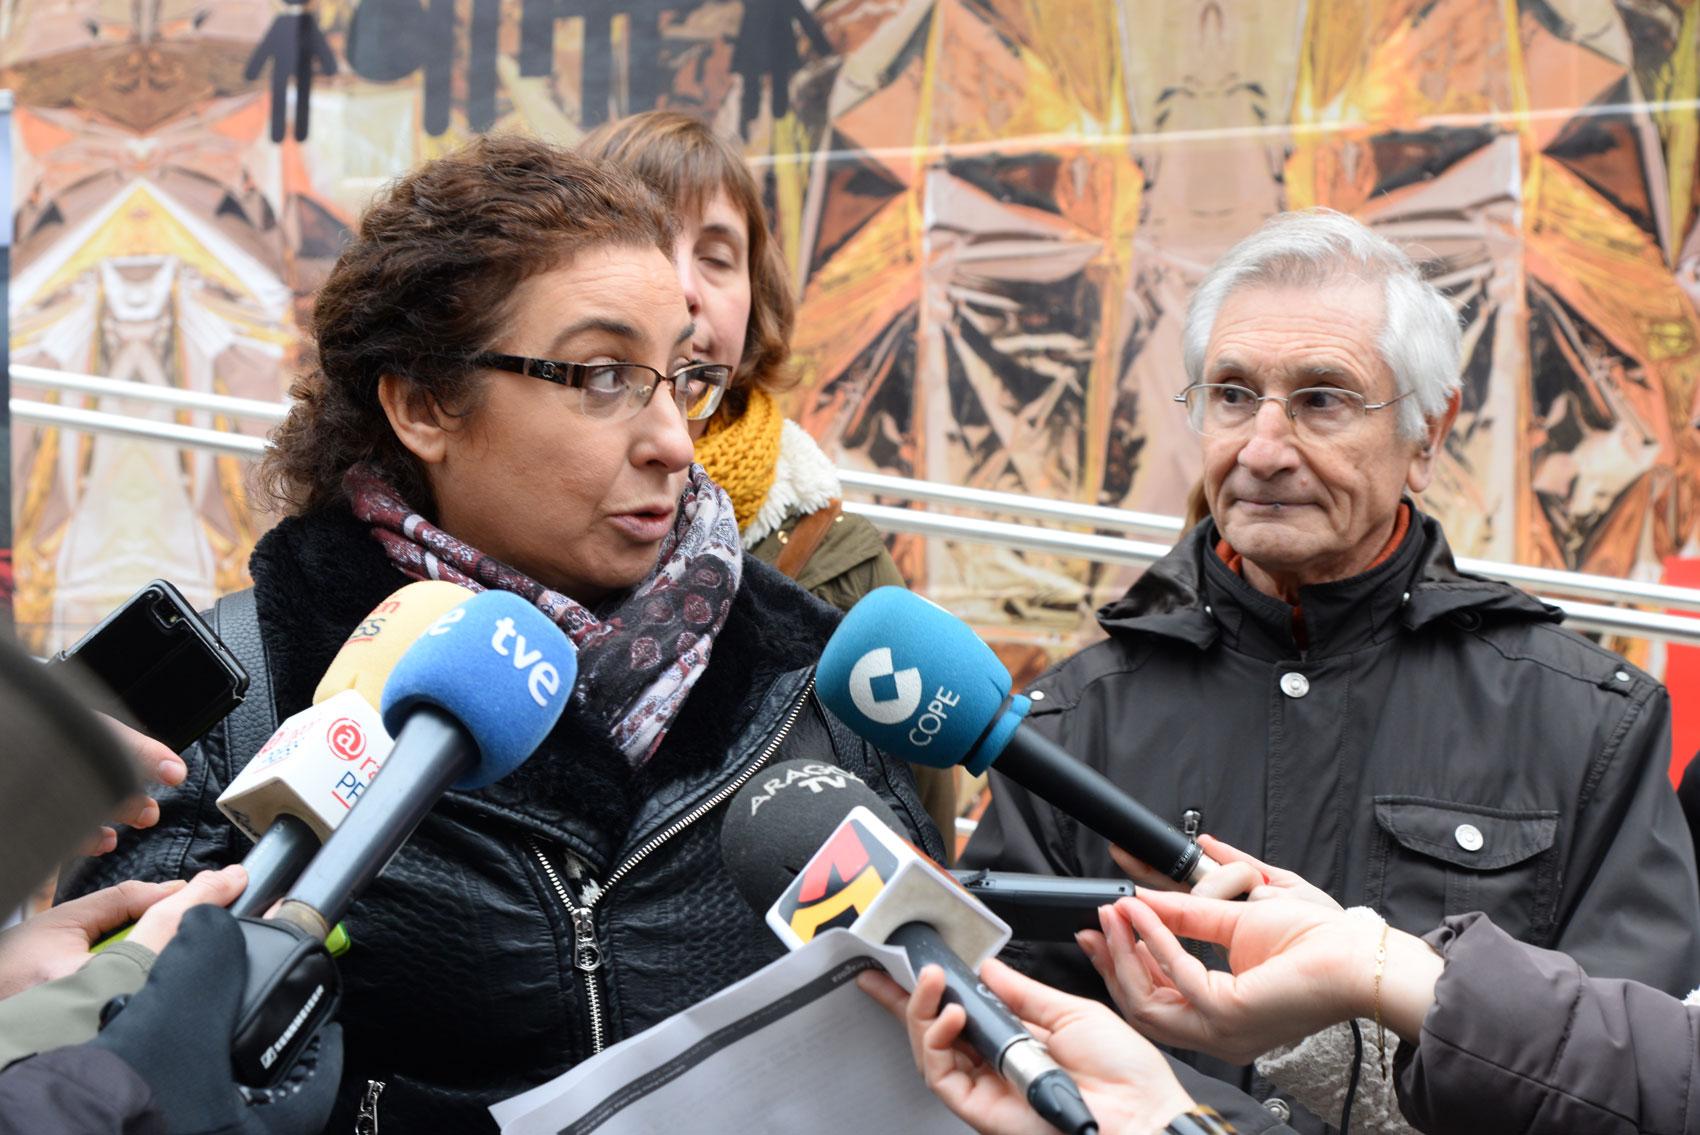 Julia Ortega MIGRAR #EsUnDerecho